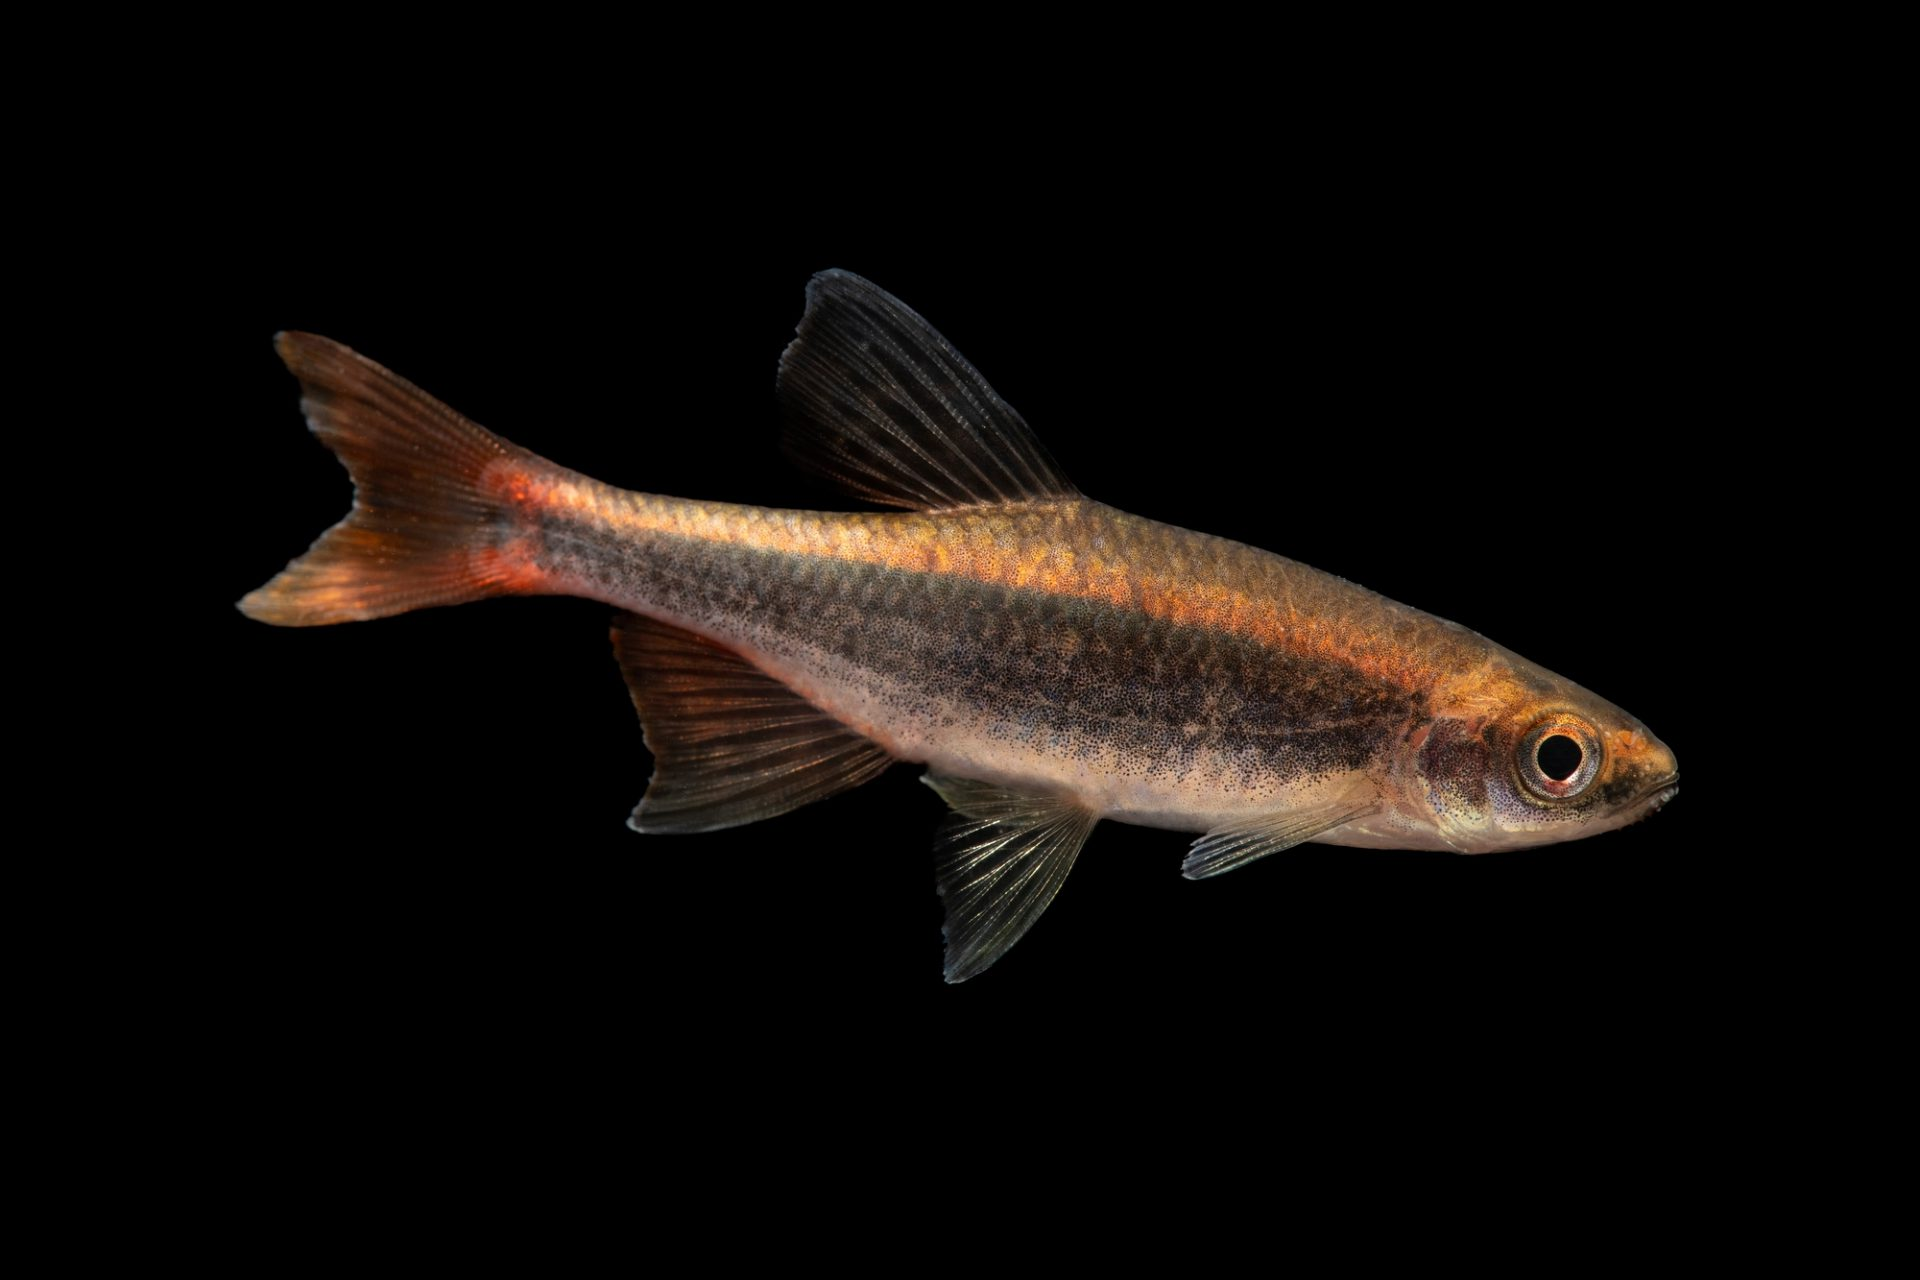 Photo: A broadstripe shiner (Pteronotropis euryzonus) at Fish Biodiversity Lab, Auburn University, Auburn, Alabama.